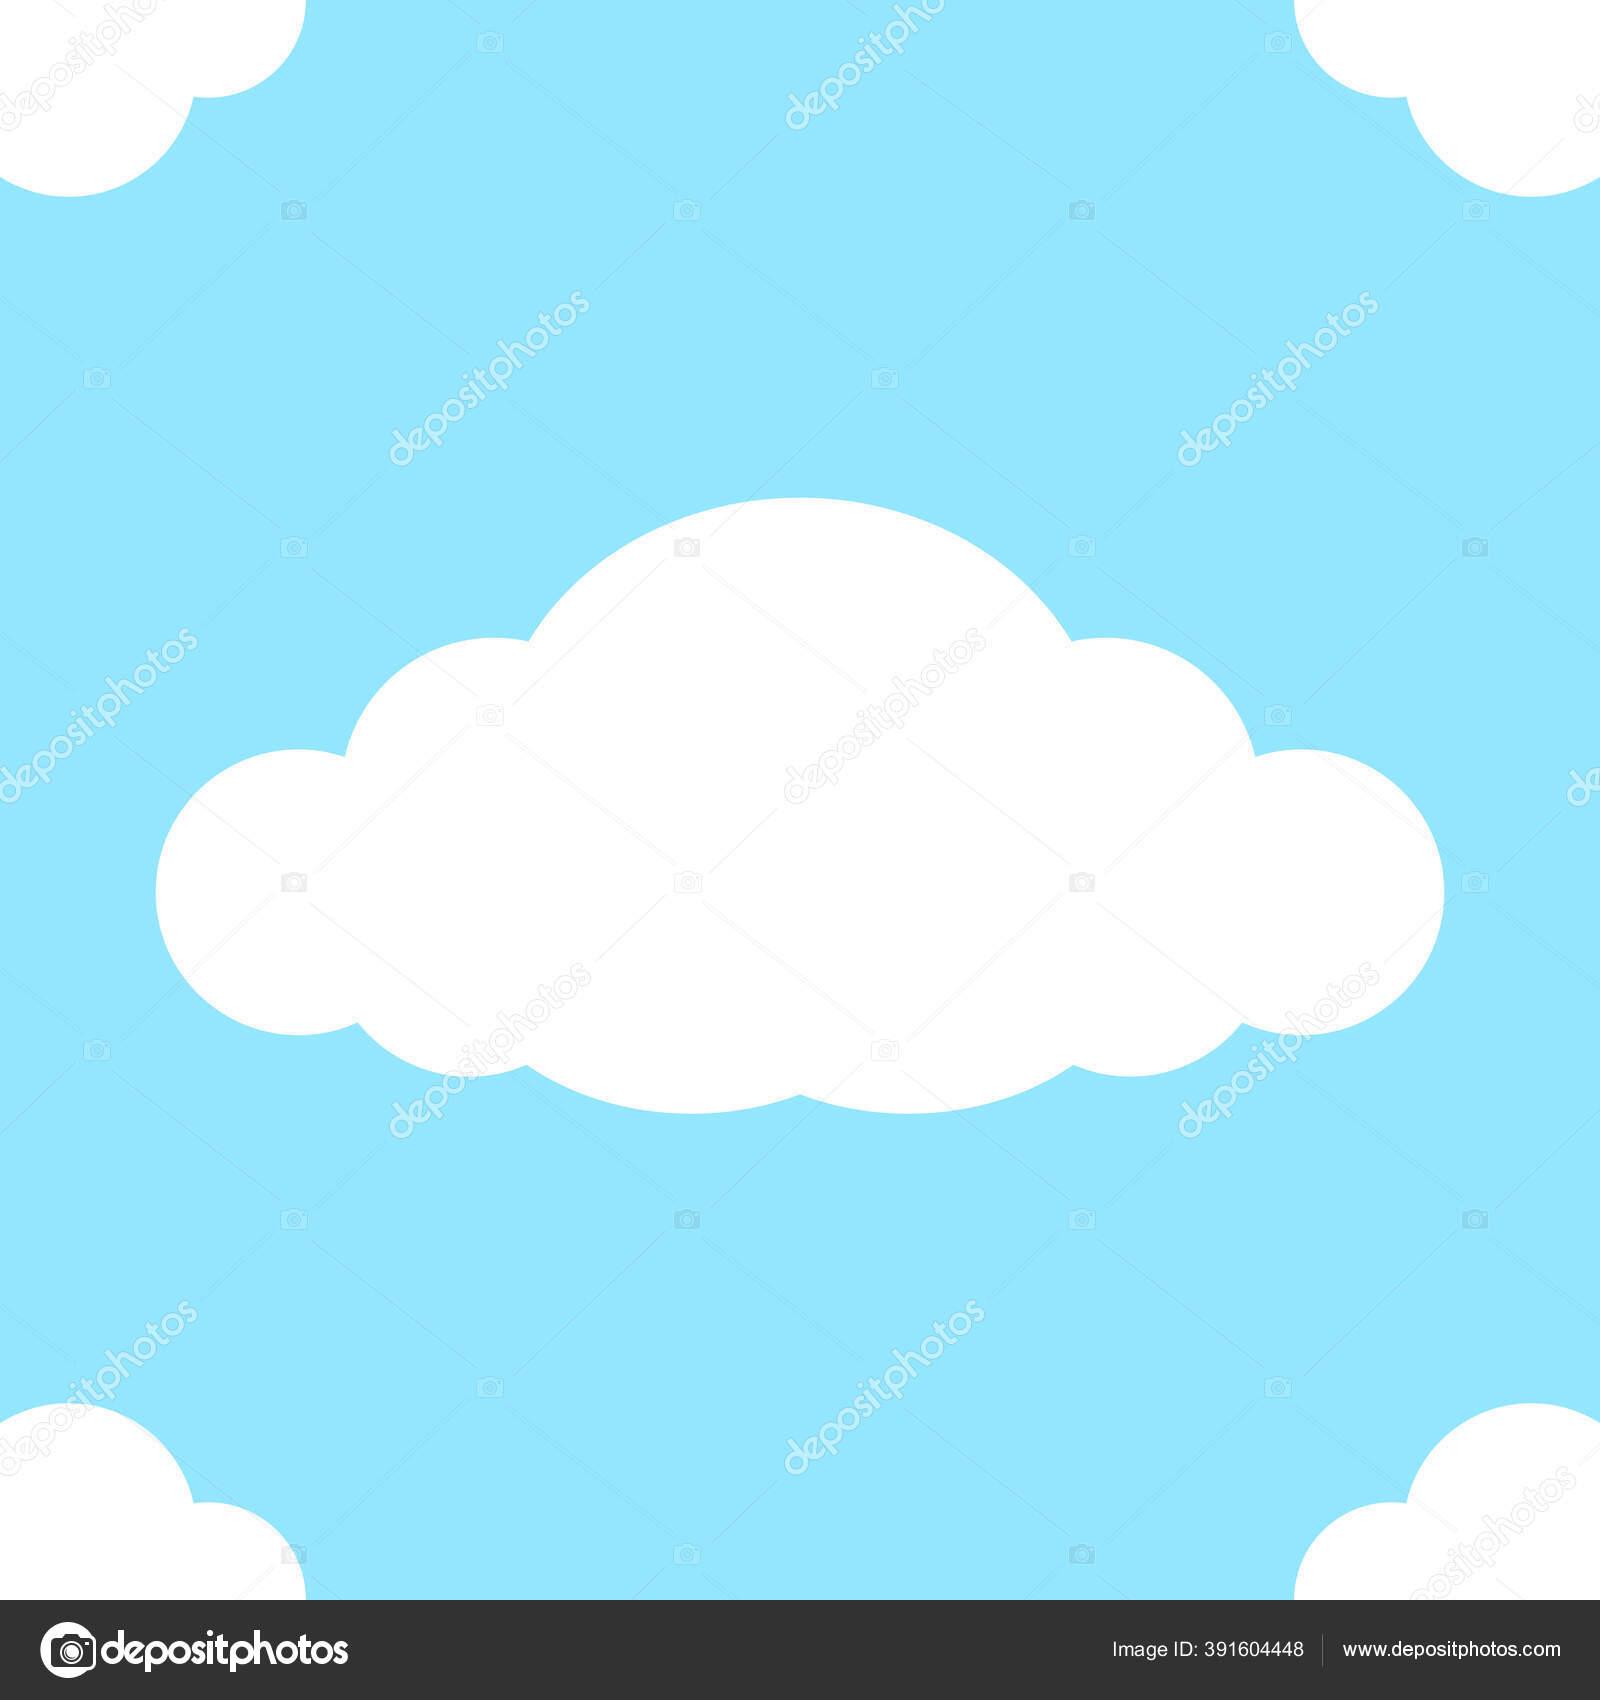 depositphotos 391604448 stock illustration cute clouds seamless pastel square